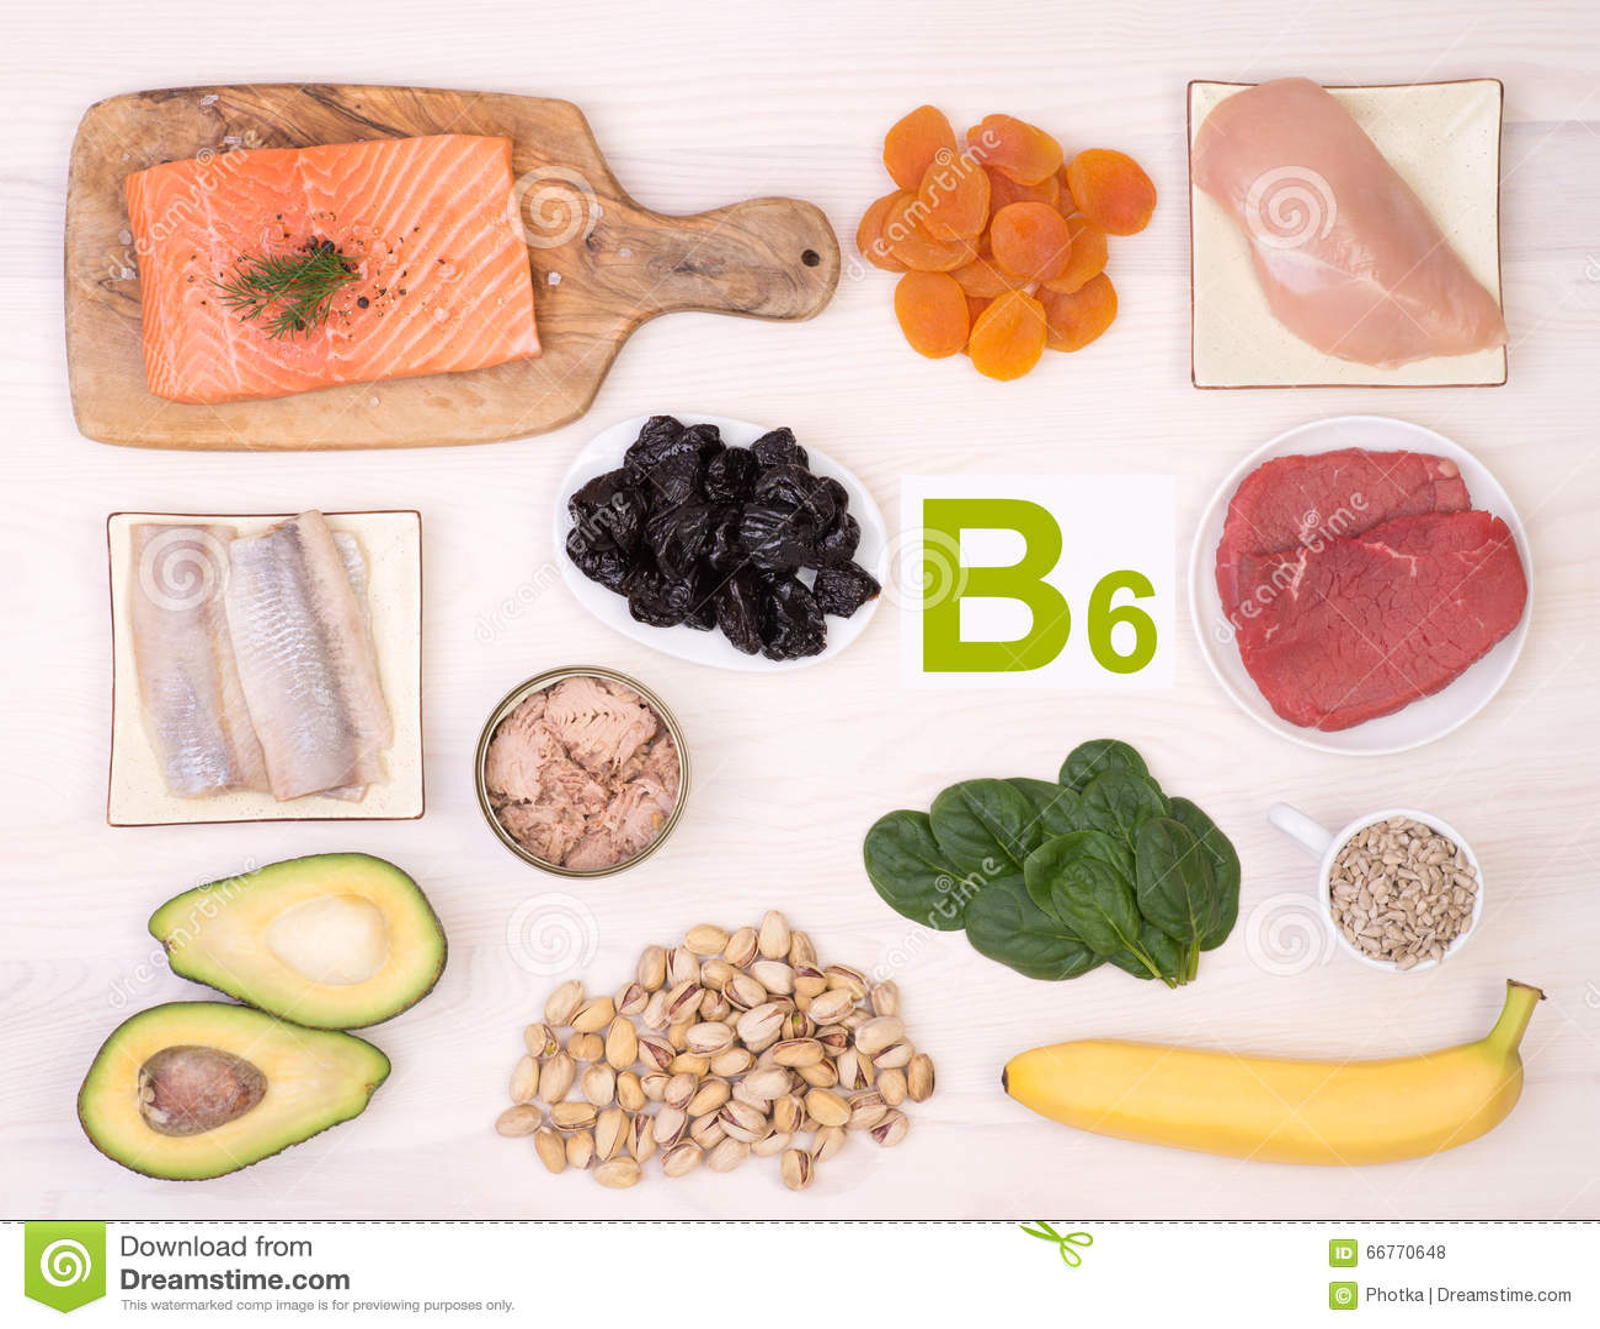 Vitamin B Food Sources